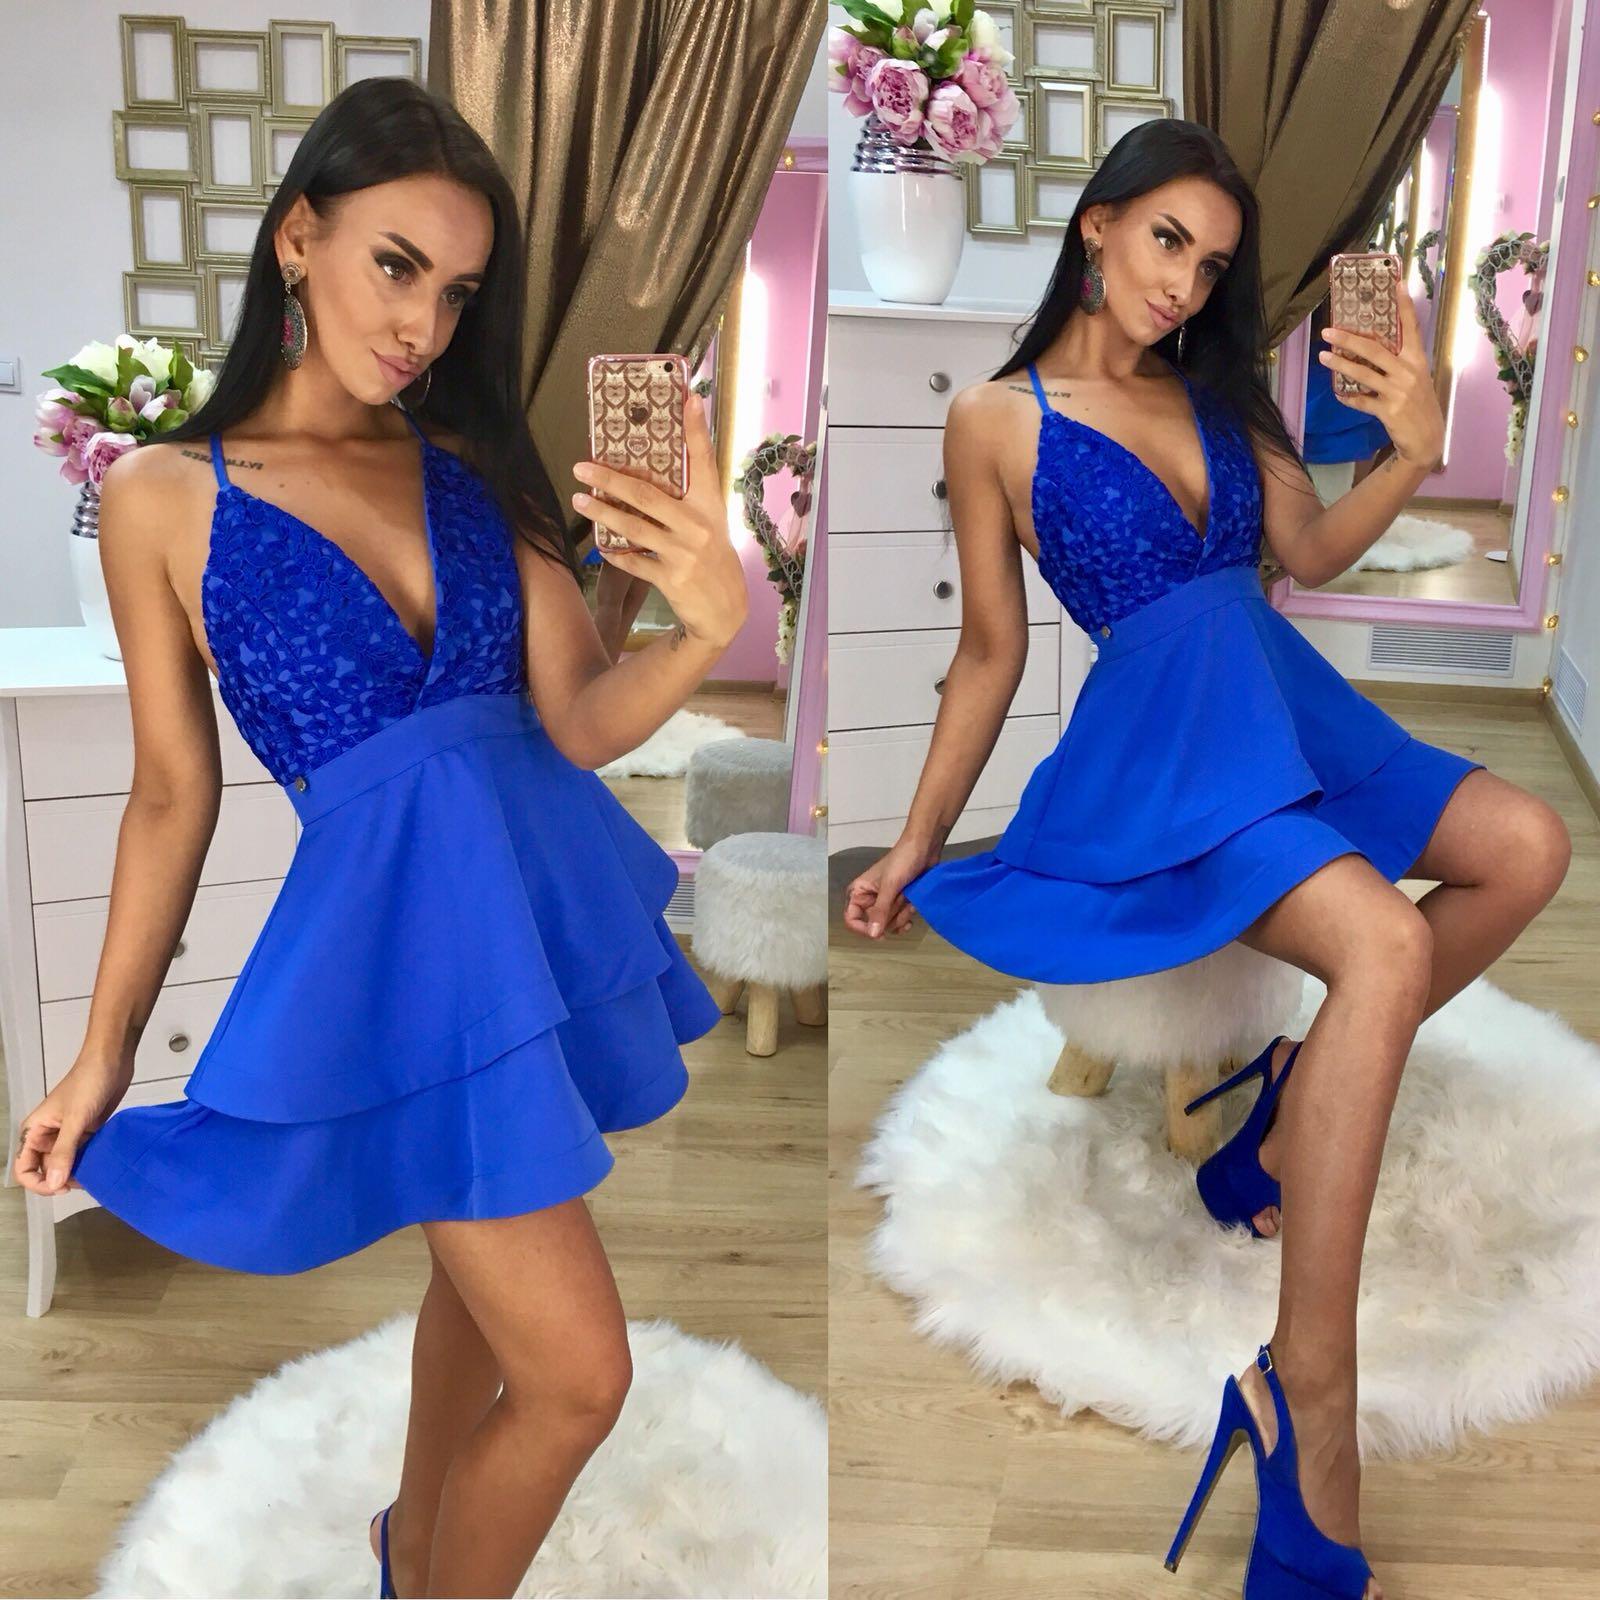 Dámske královské modré šaty Foggi BLUE - L odporúčame pre M